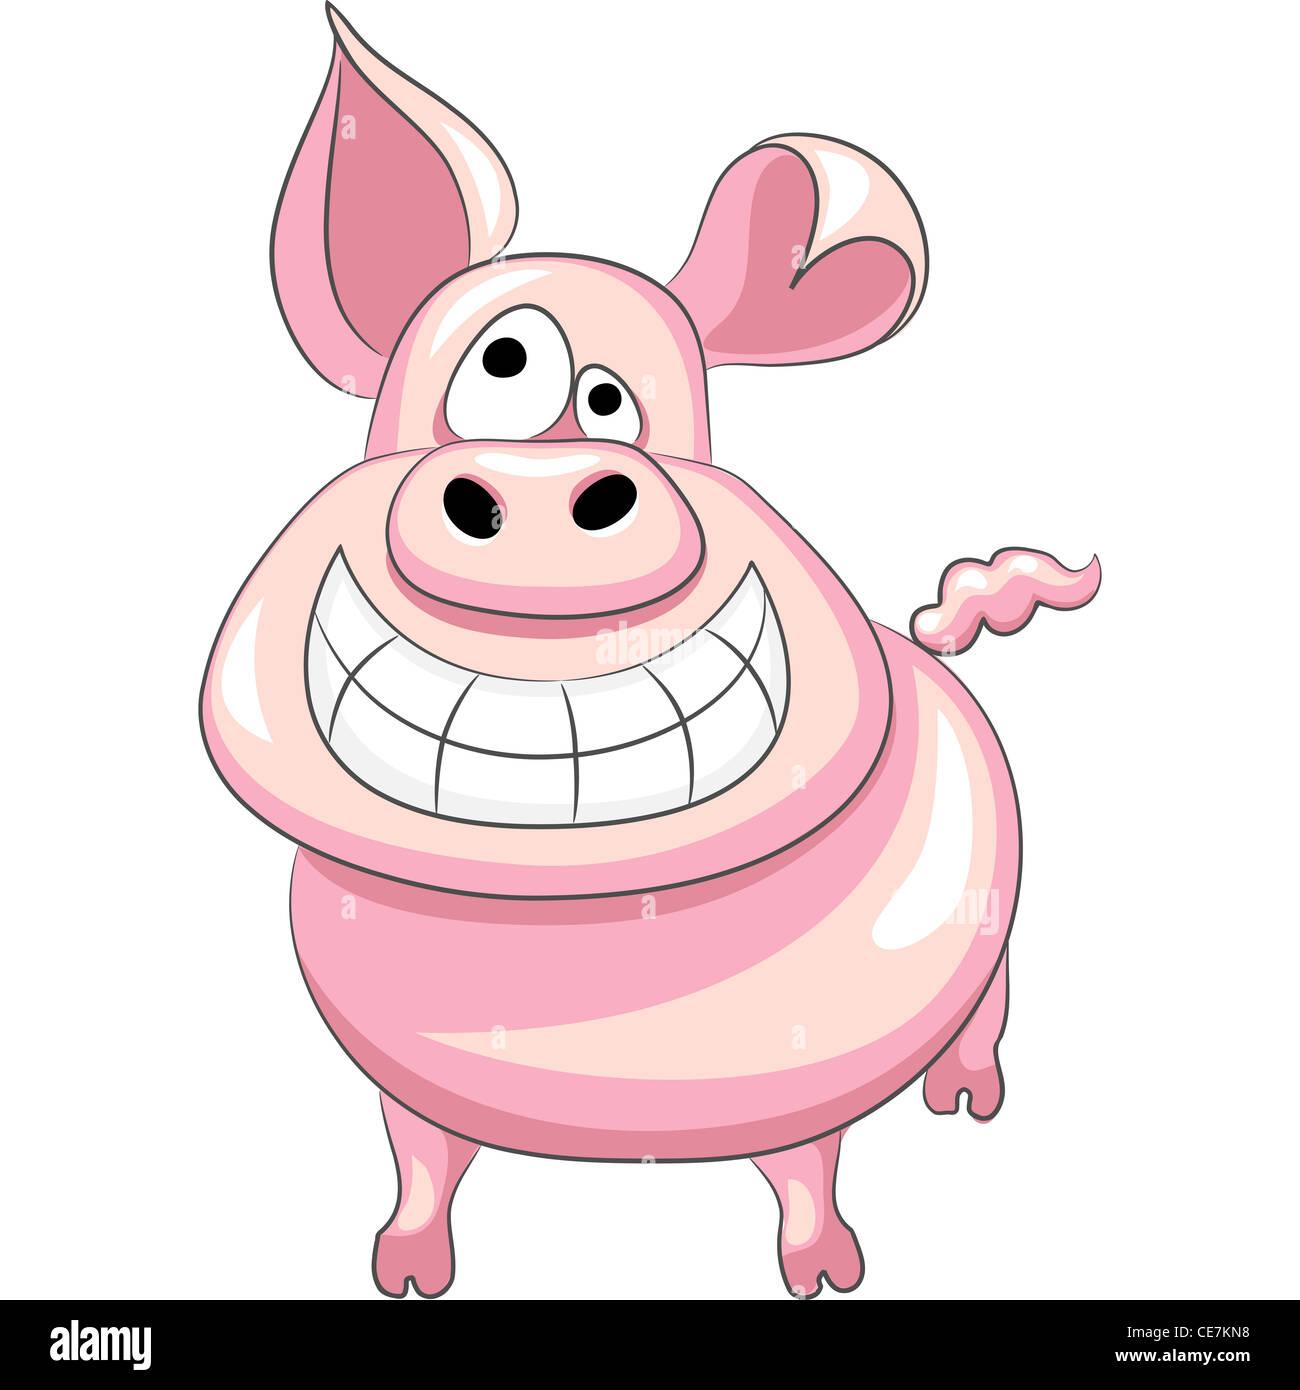 funny cartoon happy pig smile - Stock Image